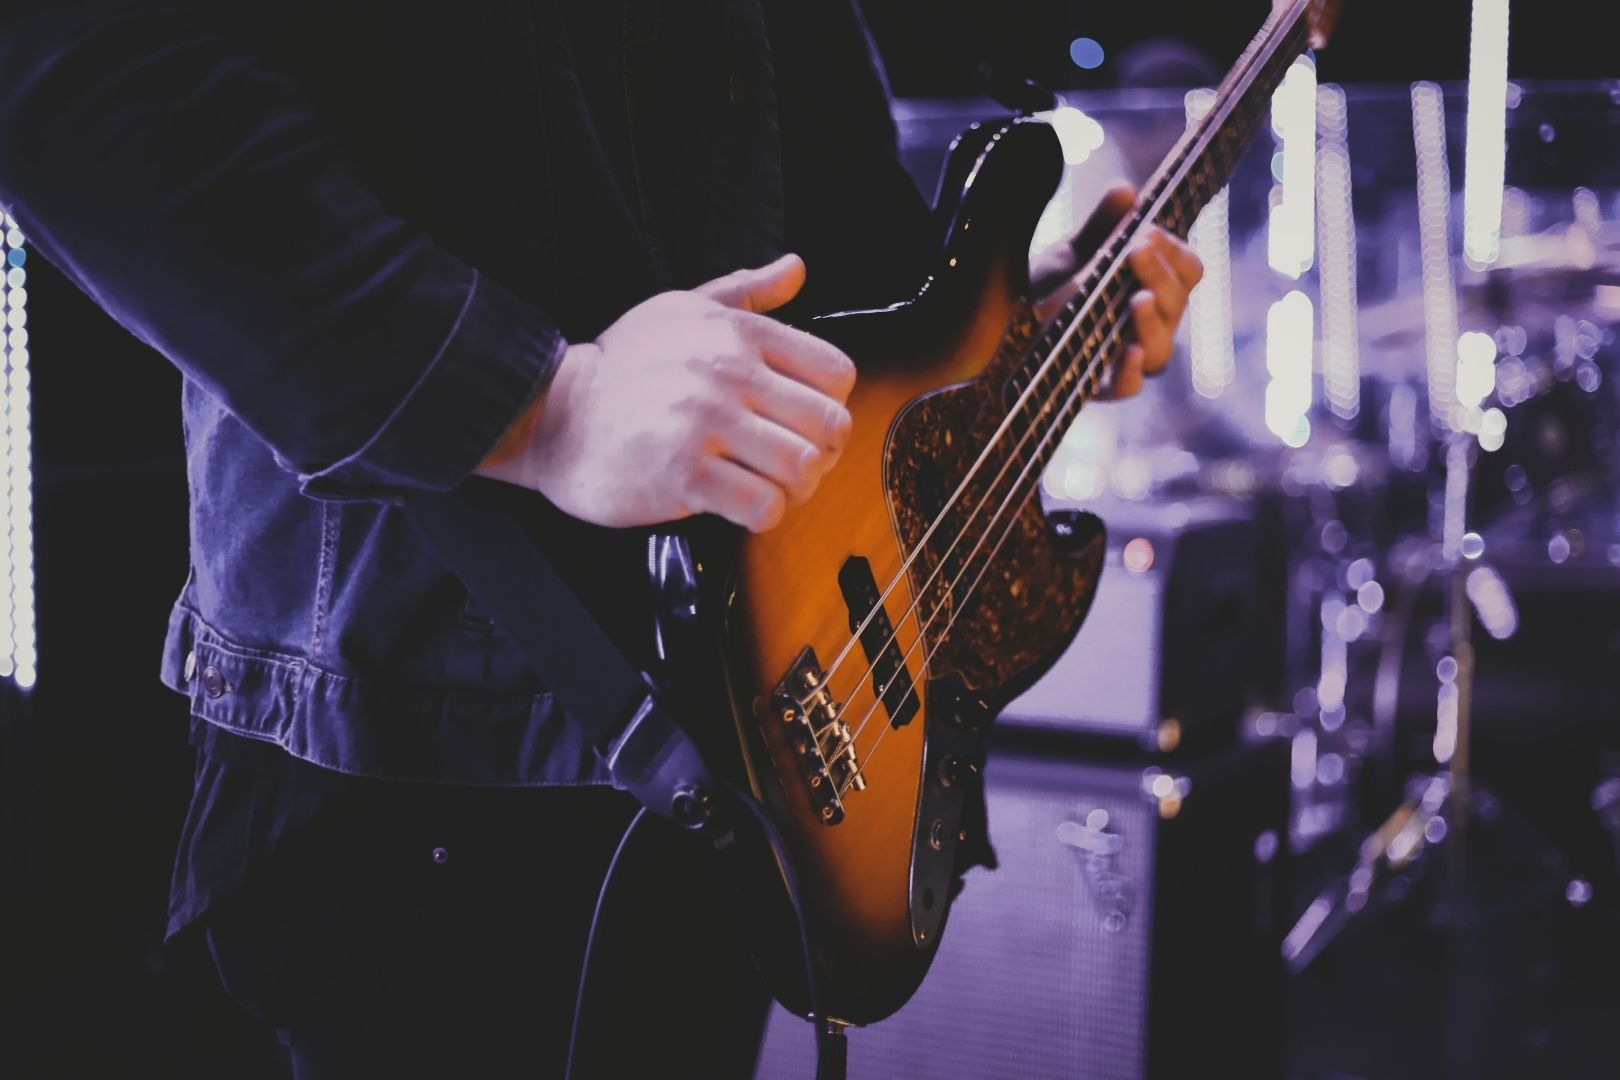 how to mix bass guitar in logic pro x - decibel peak academy